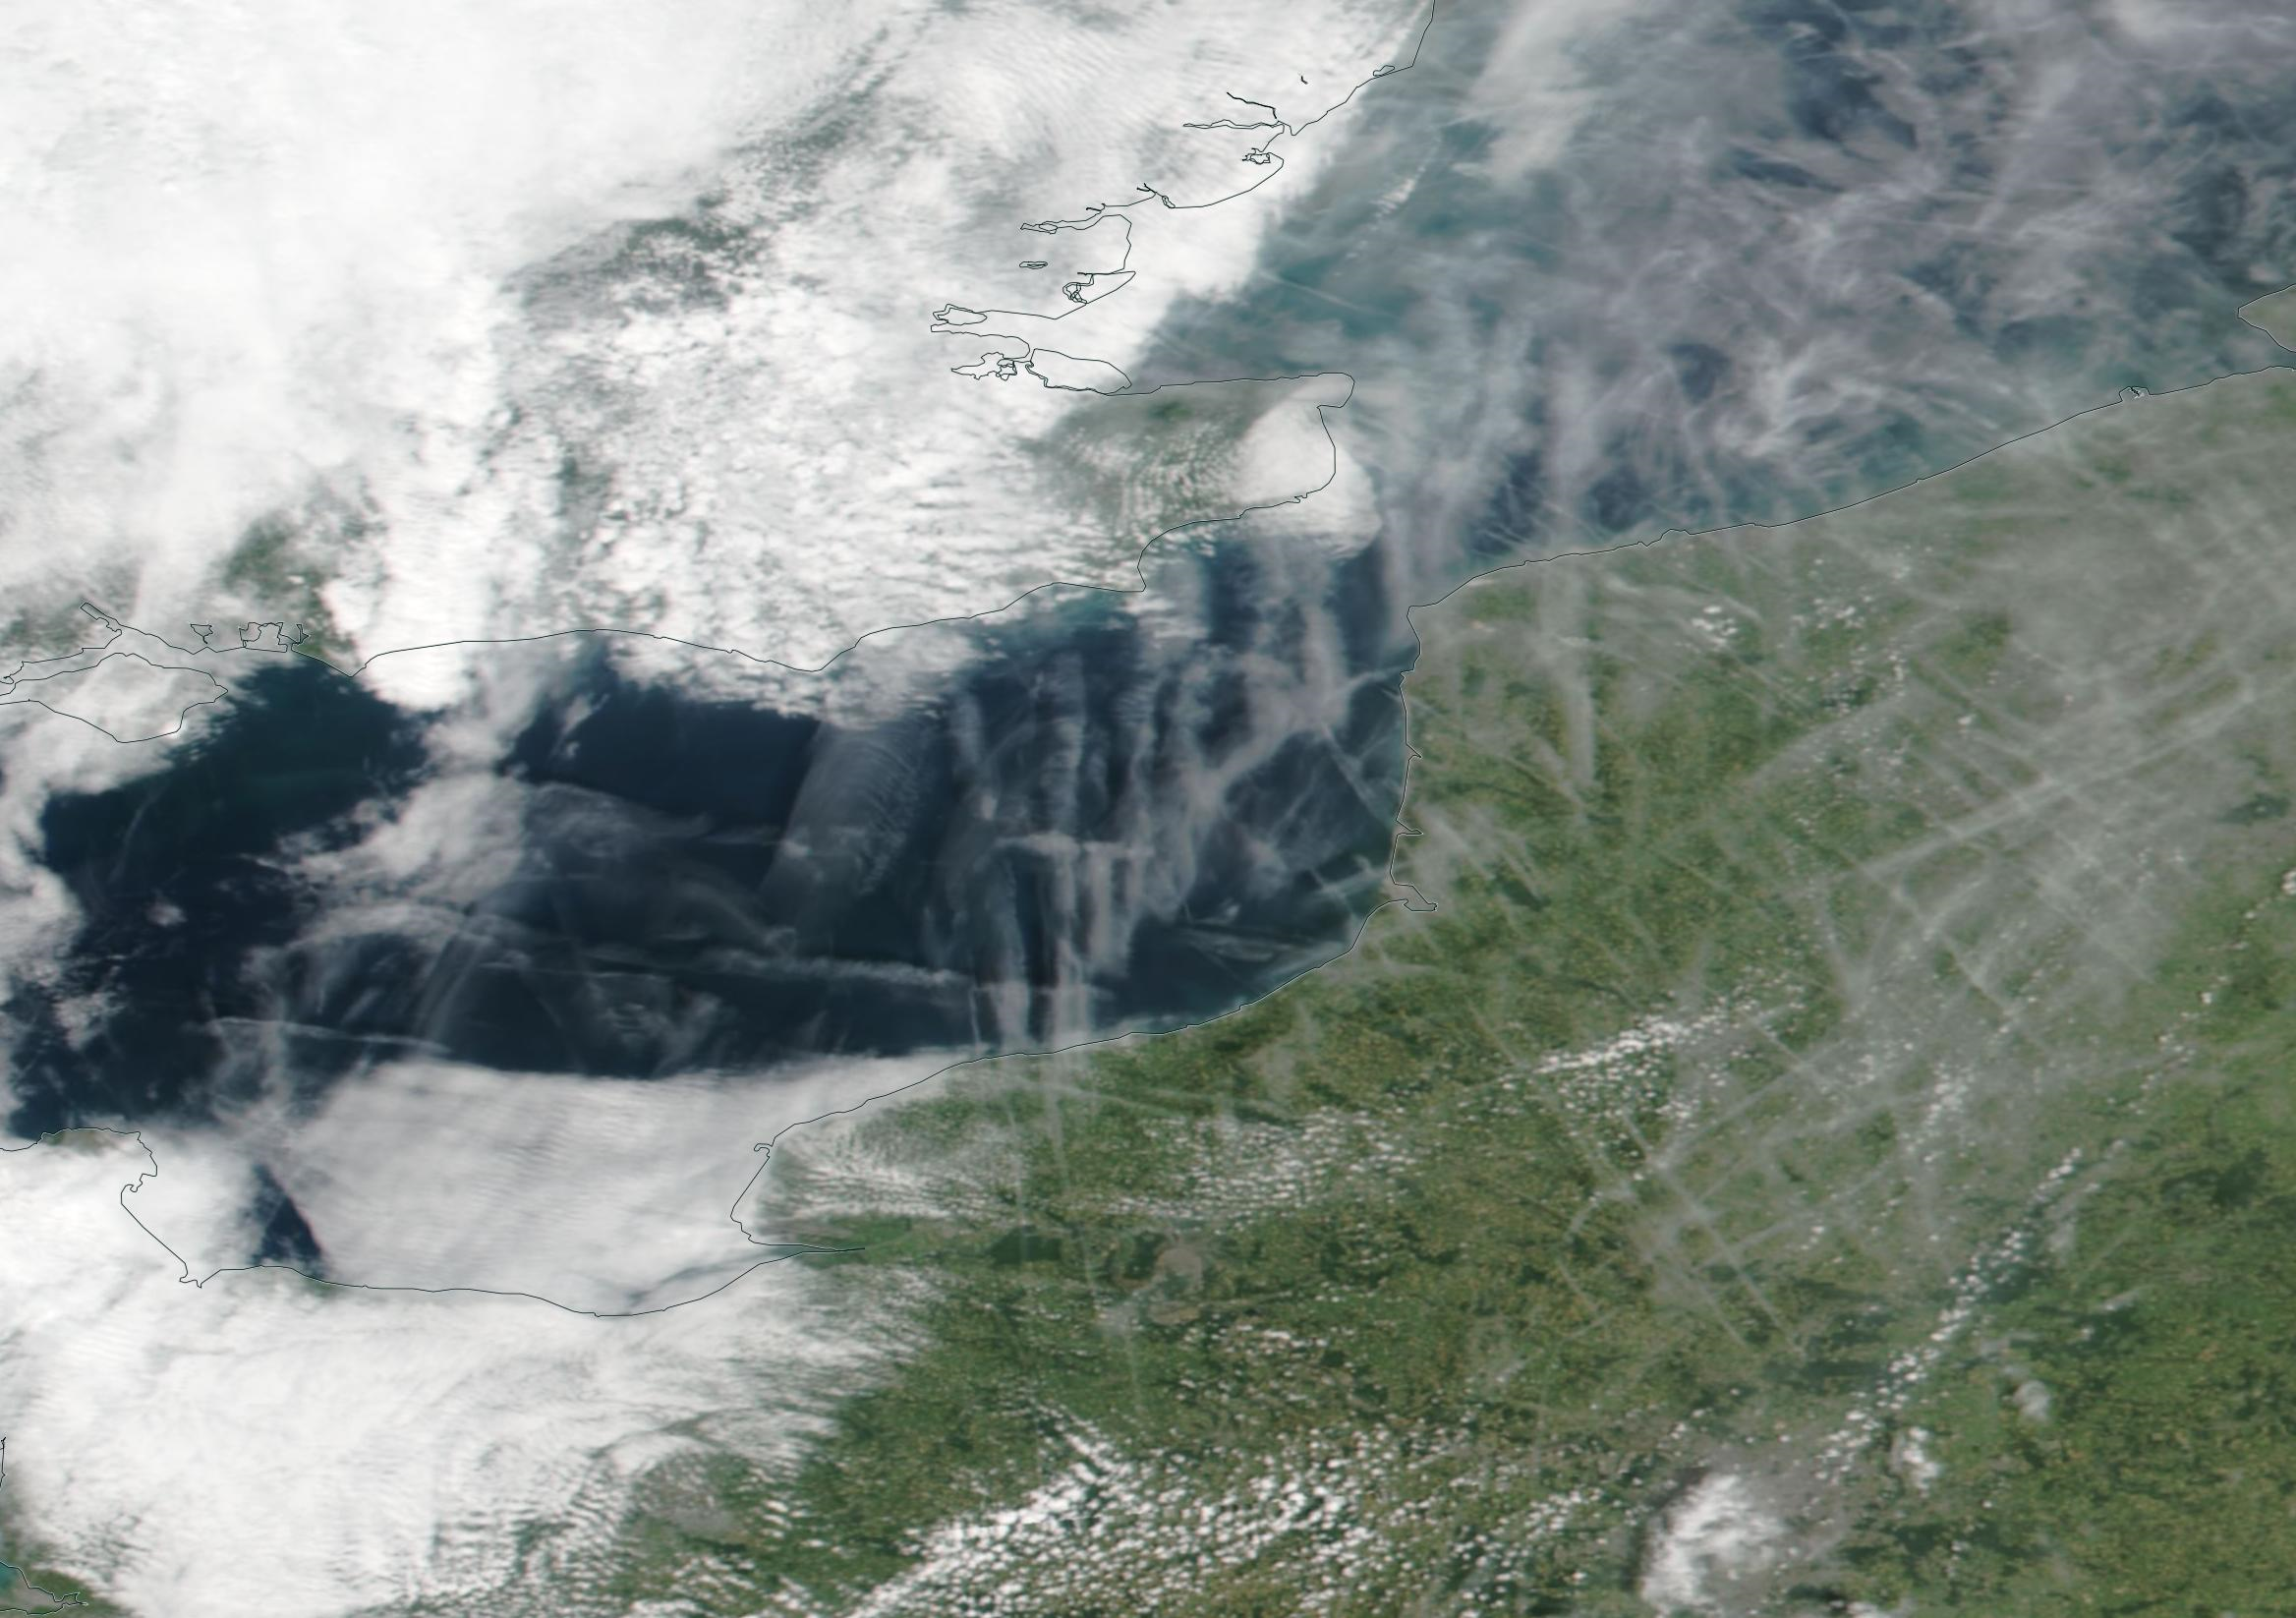 Chemtrail geoengineering English Channel, Le Havre, Calais, Tuesday 25th June 2019. https://go.nasa.gov/2WZjG8F